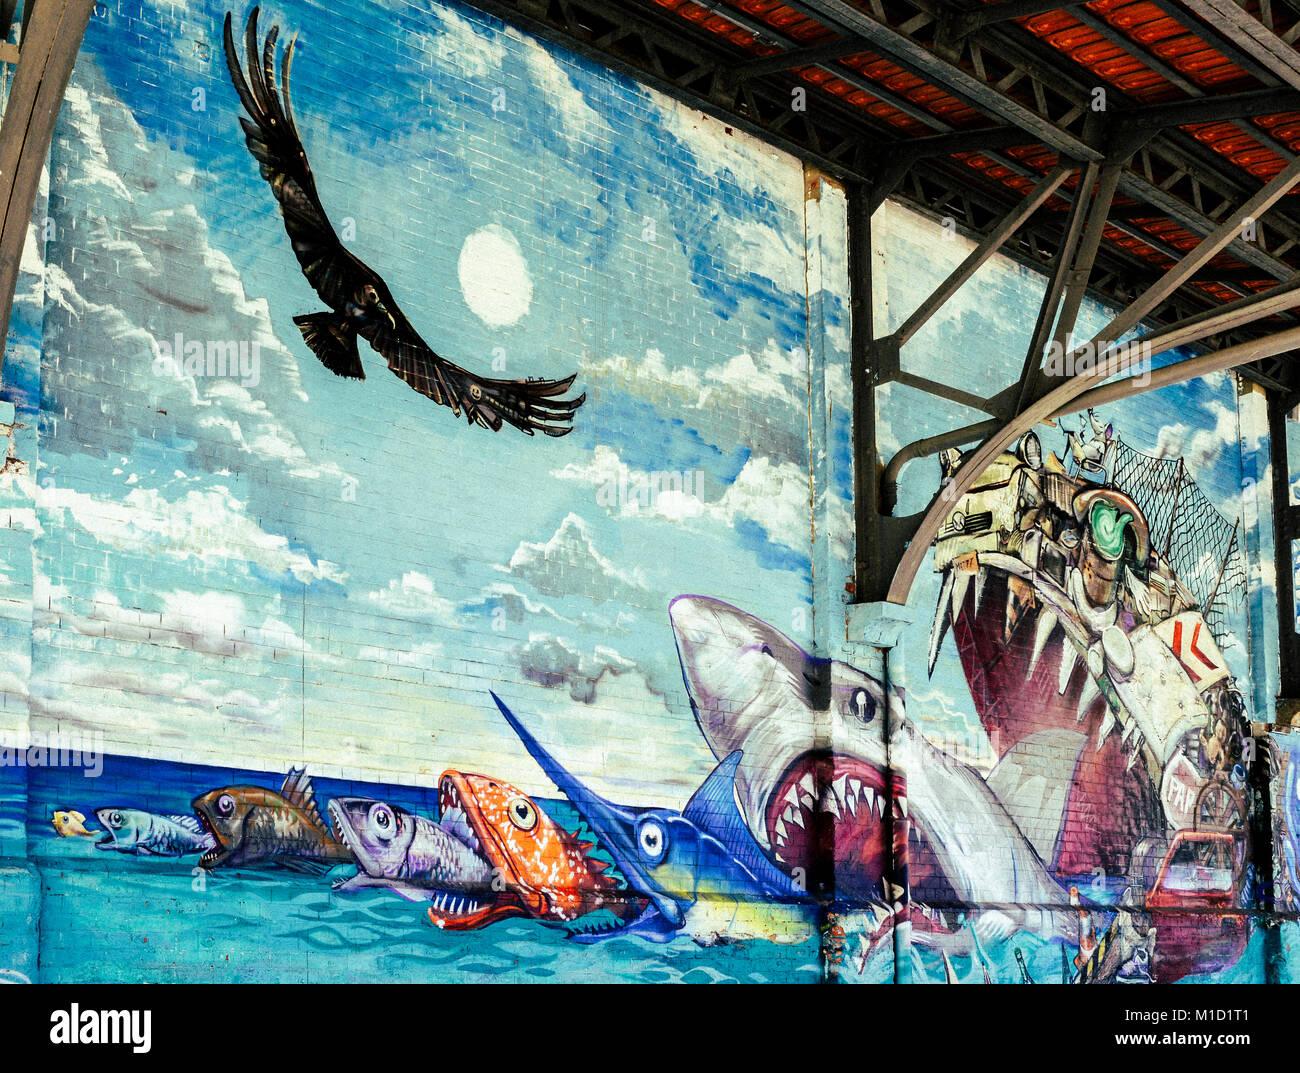 Street art in Rio de Janeiro, Brazil's Porto Maravilha District. Converted warehouses into art exhibits - food chain Stock Photo